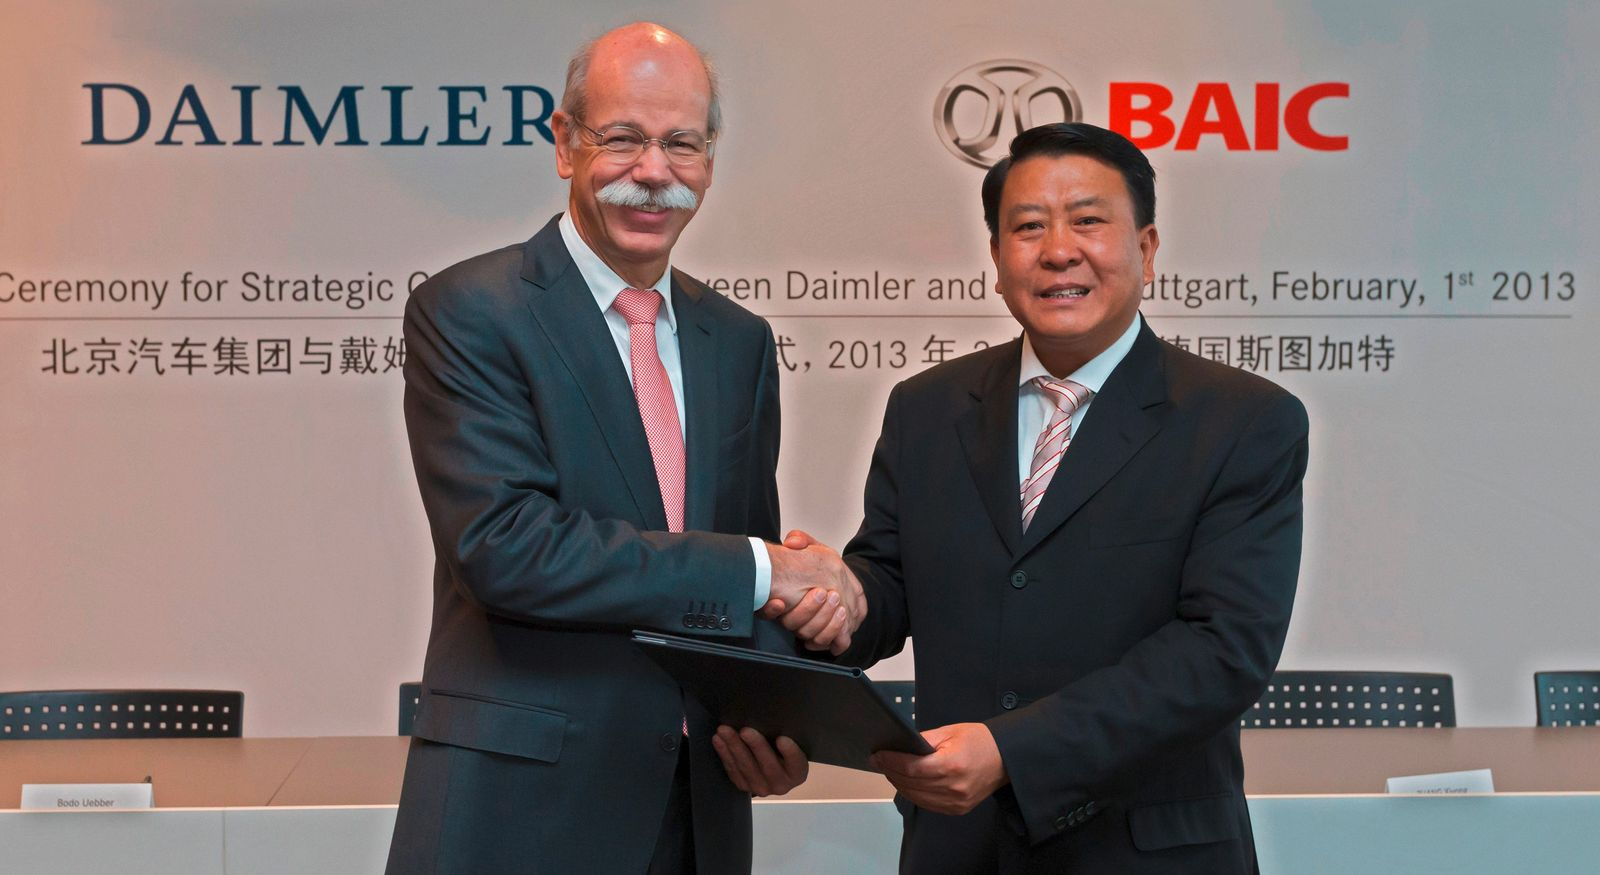 Daimler Kooperation mit BAIC / Zetsche / Xu